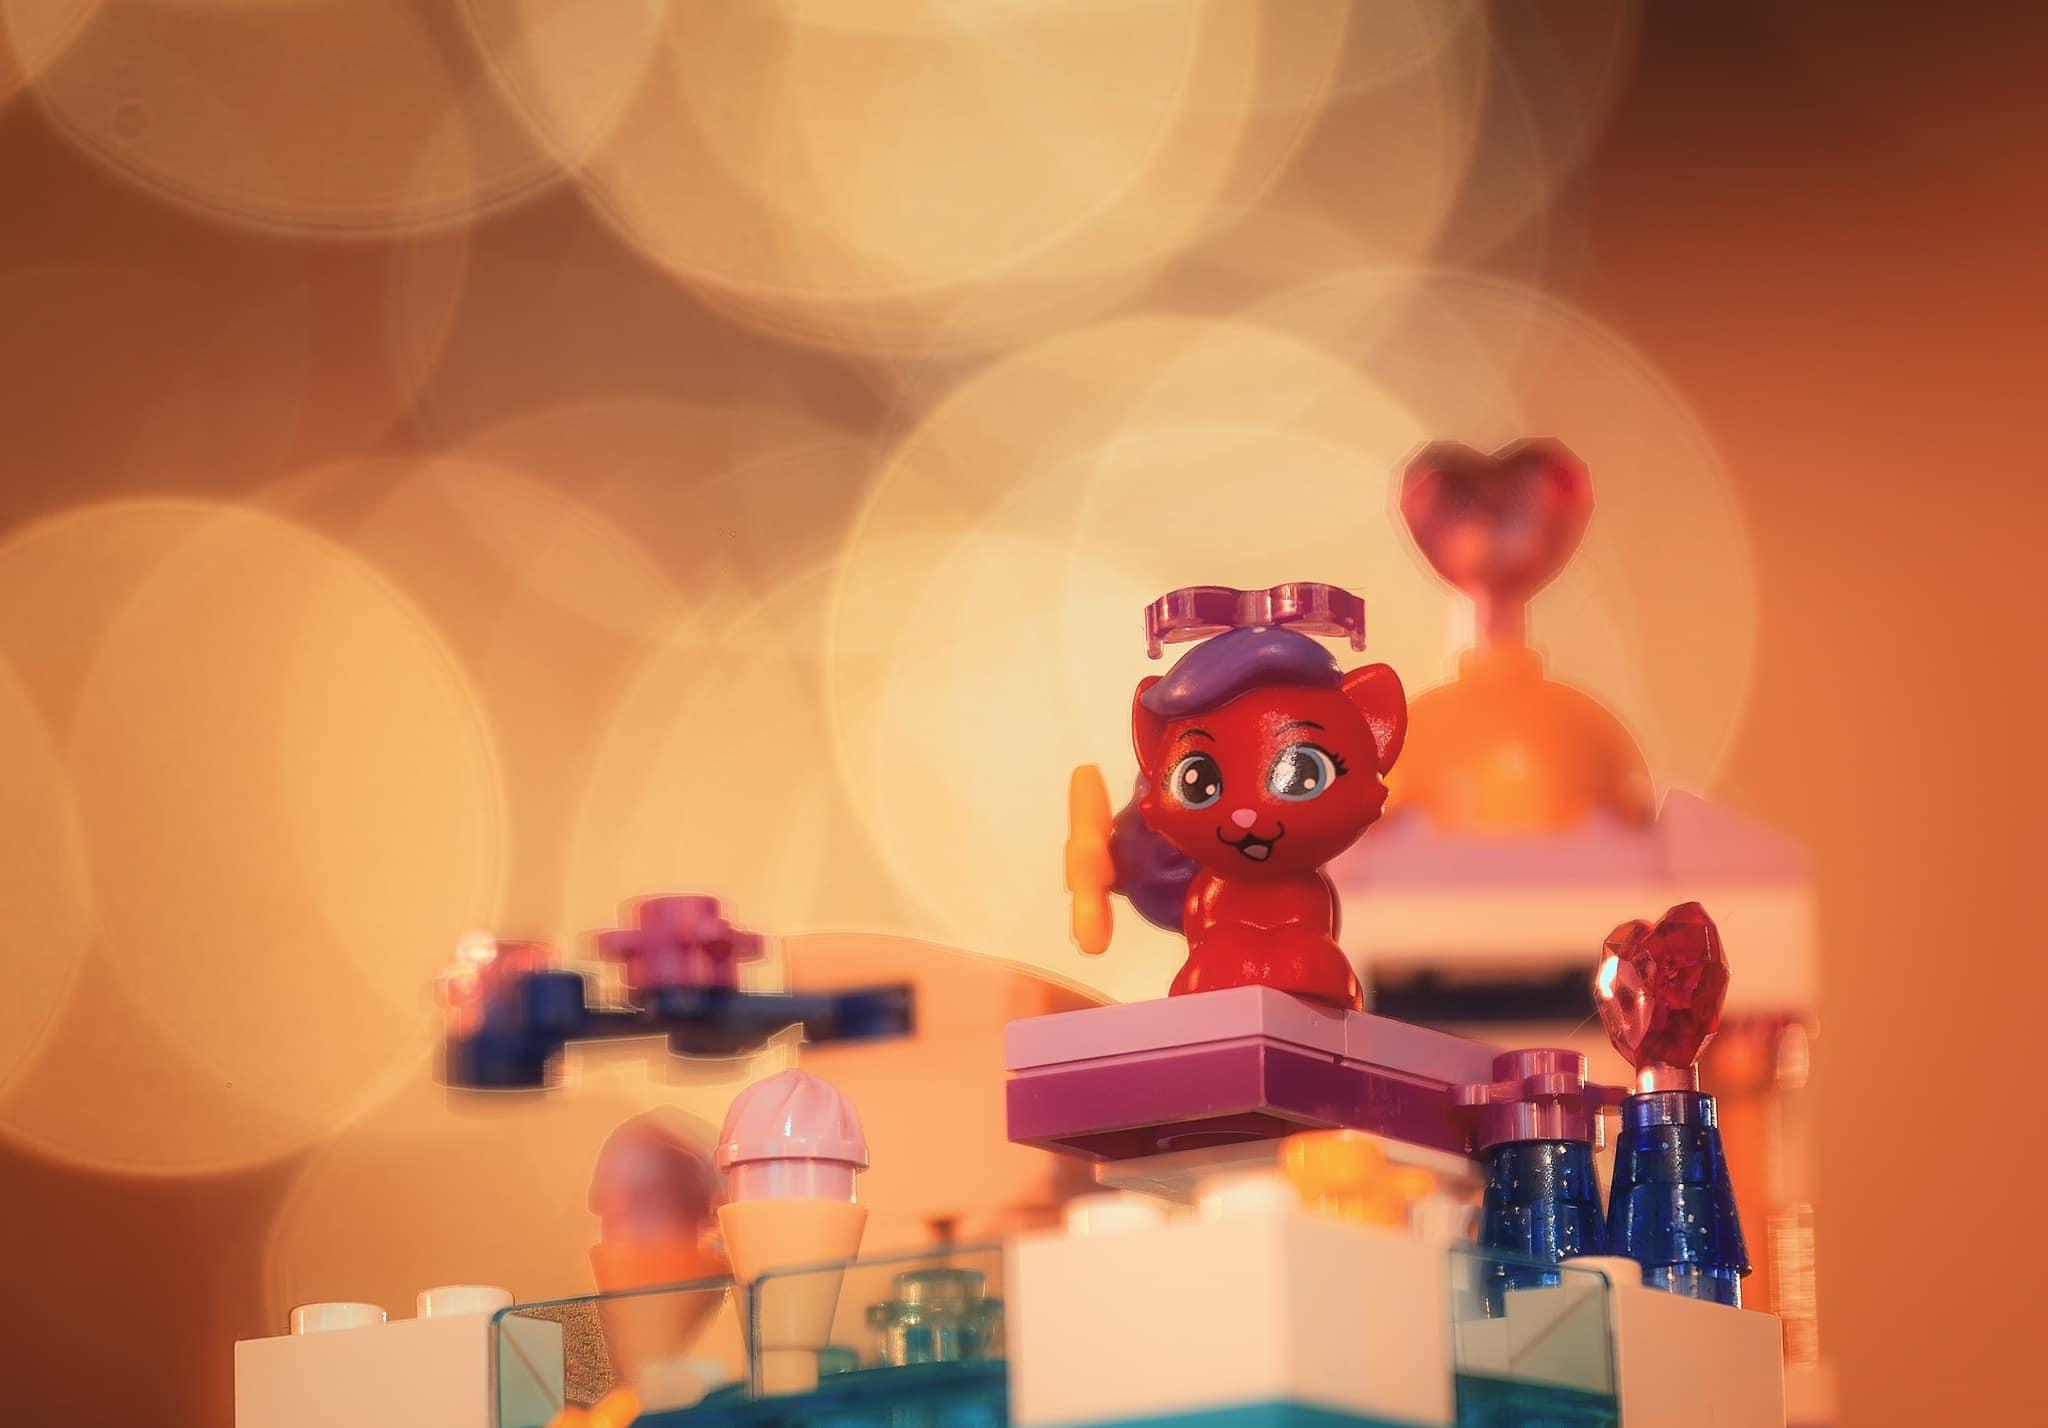 Lego - Häst i muffinsbager - Ludwig Sörmlind